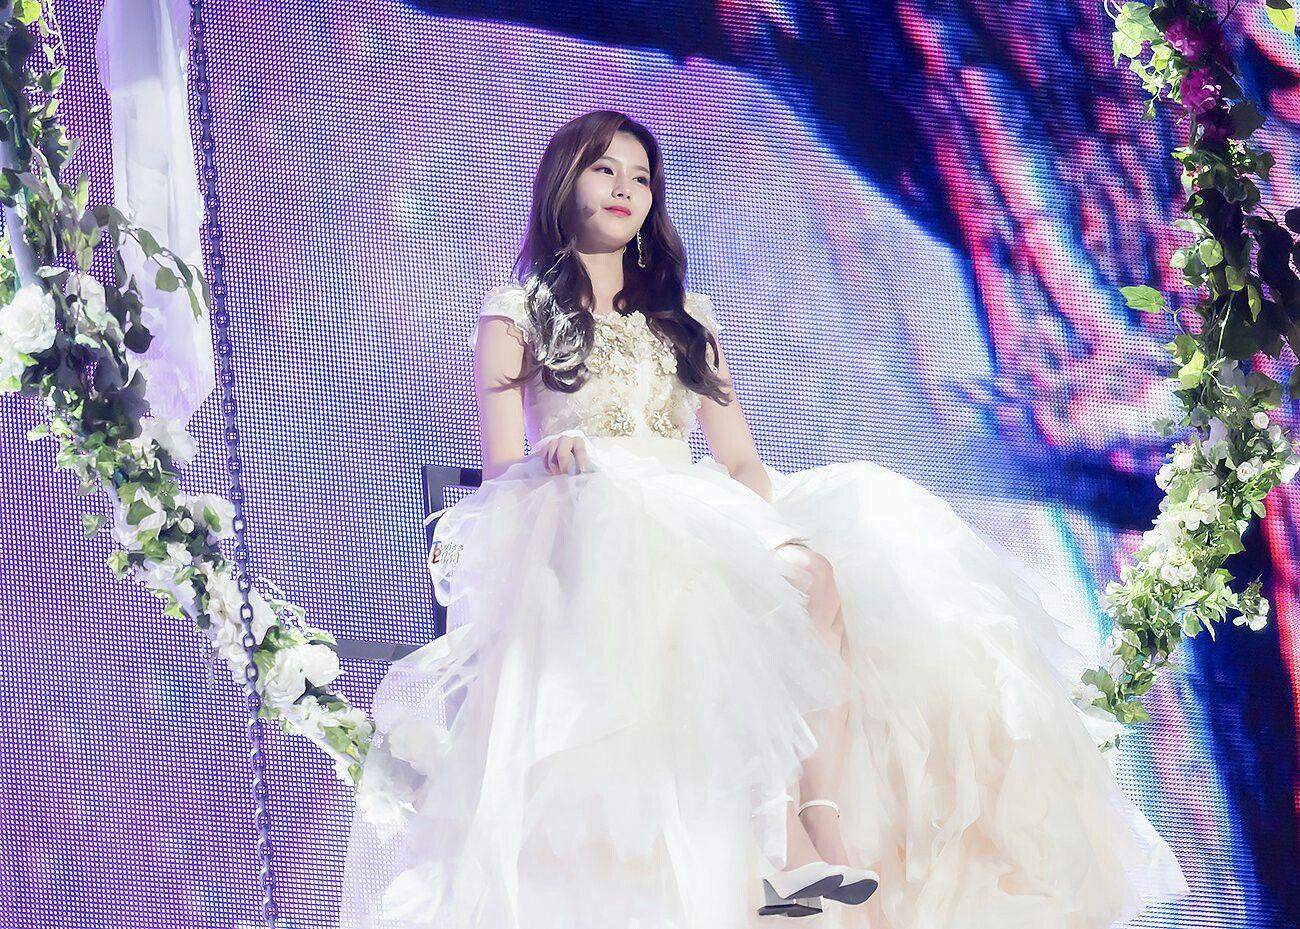 sana dress 23